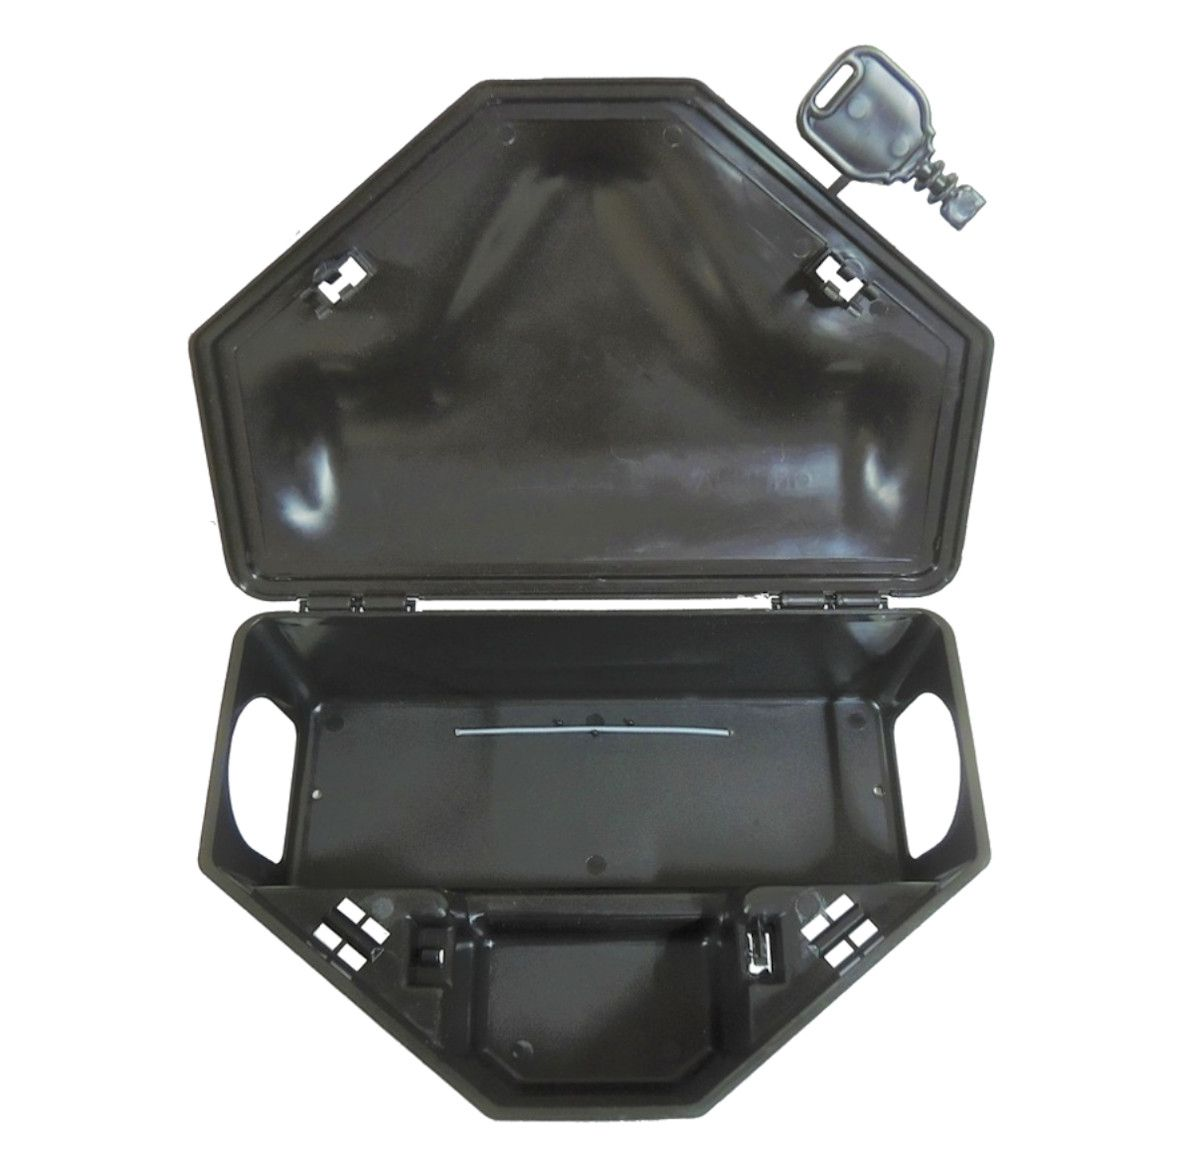 Kit 33 Porta Isca C/2 Chaves + 33 Bloco Extrusado Mata Seca